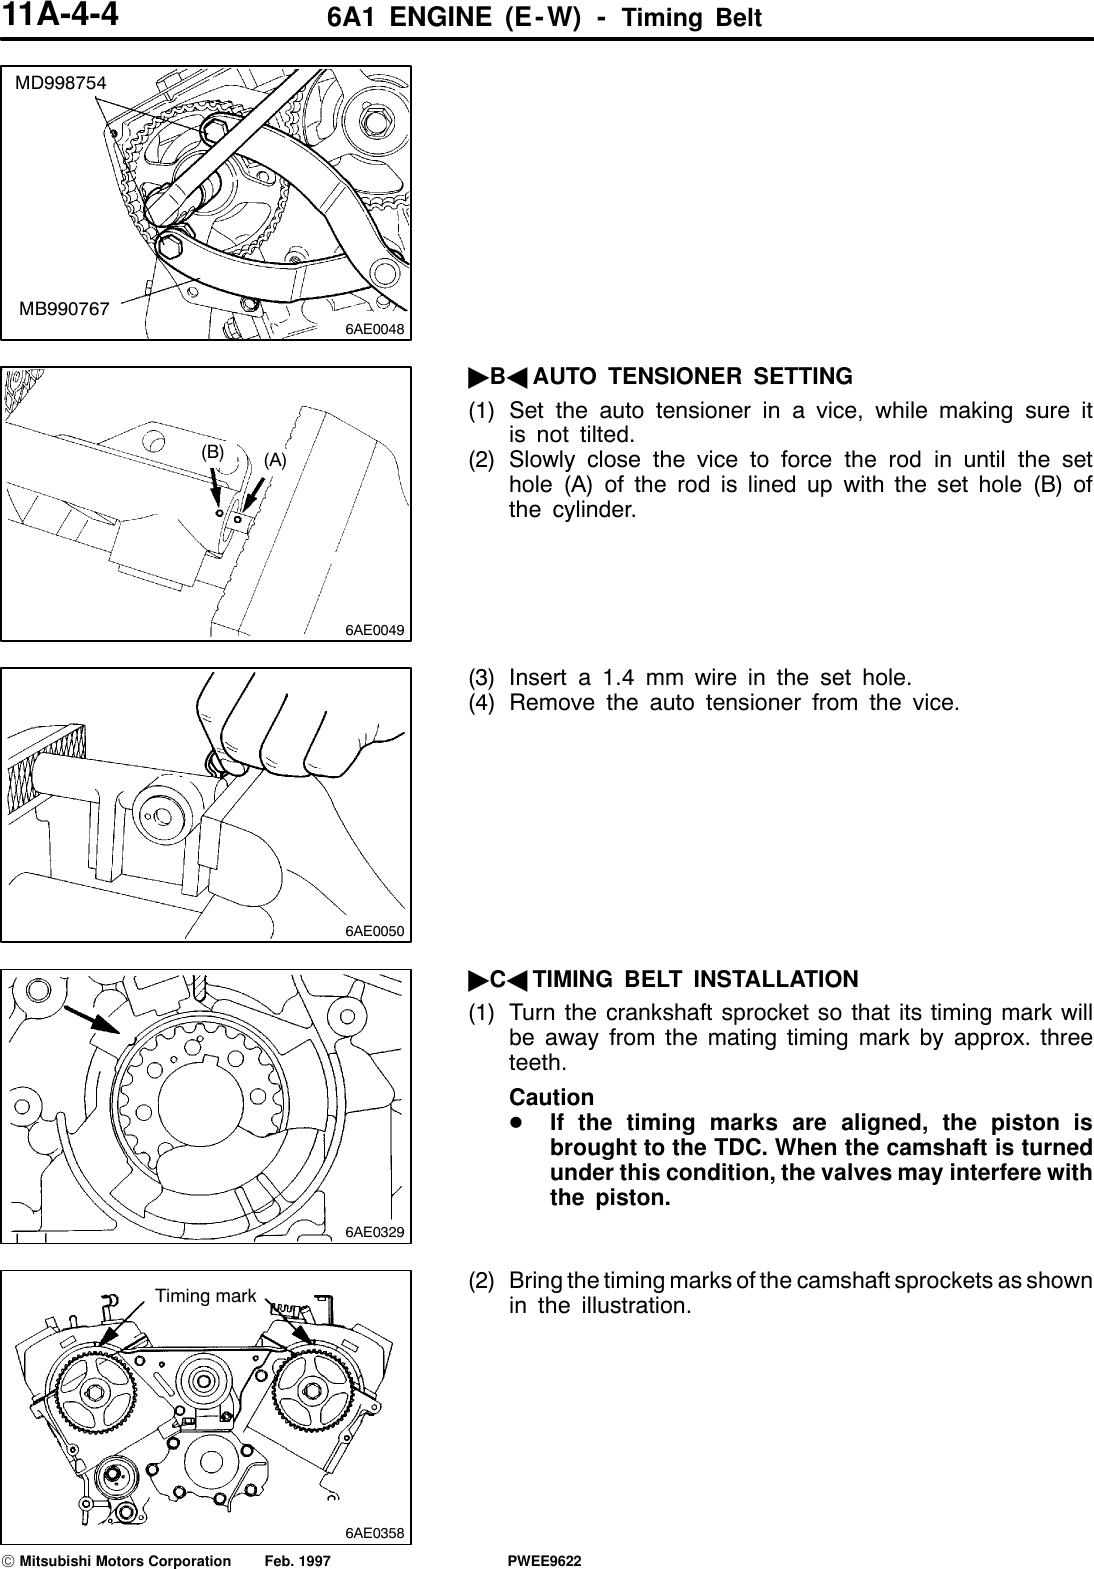 Mitsubishi 6A1 Users Manual ENGINE Workshop 6A1(E W)